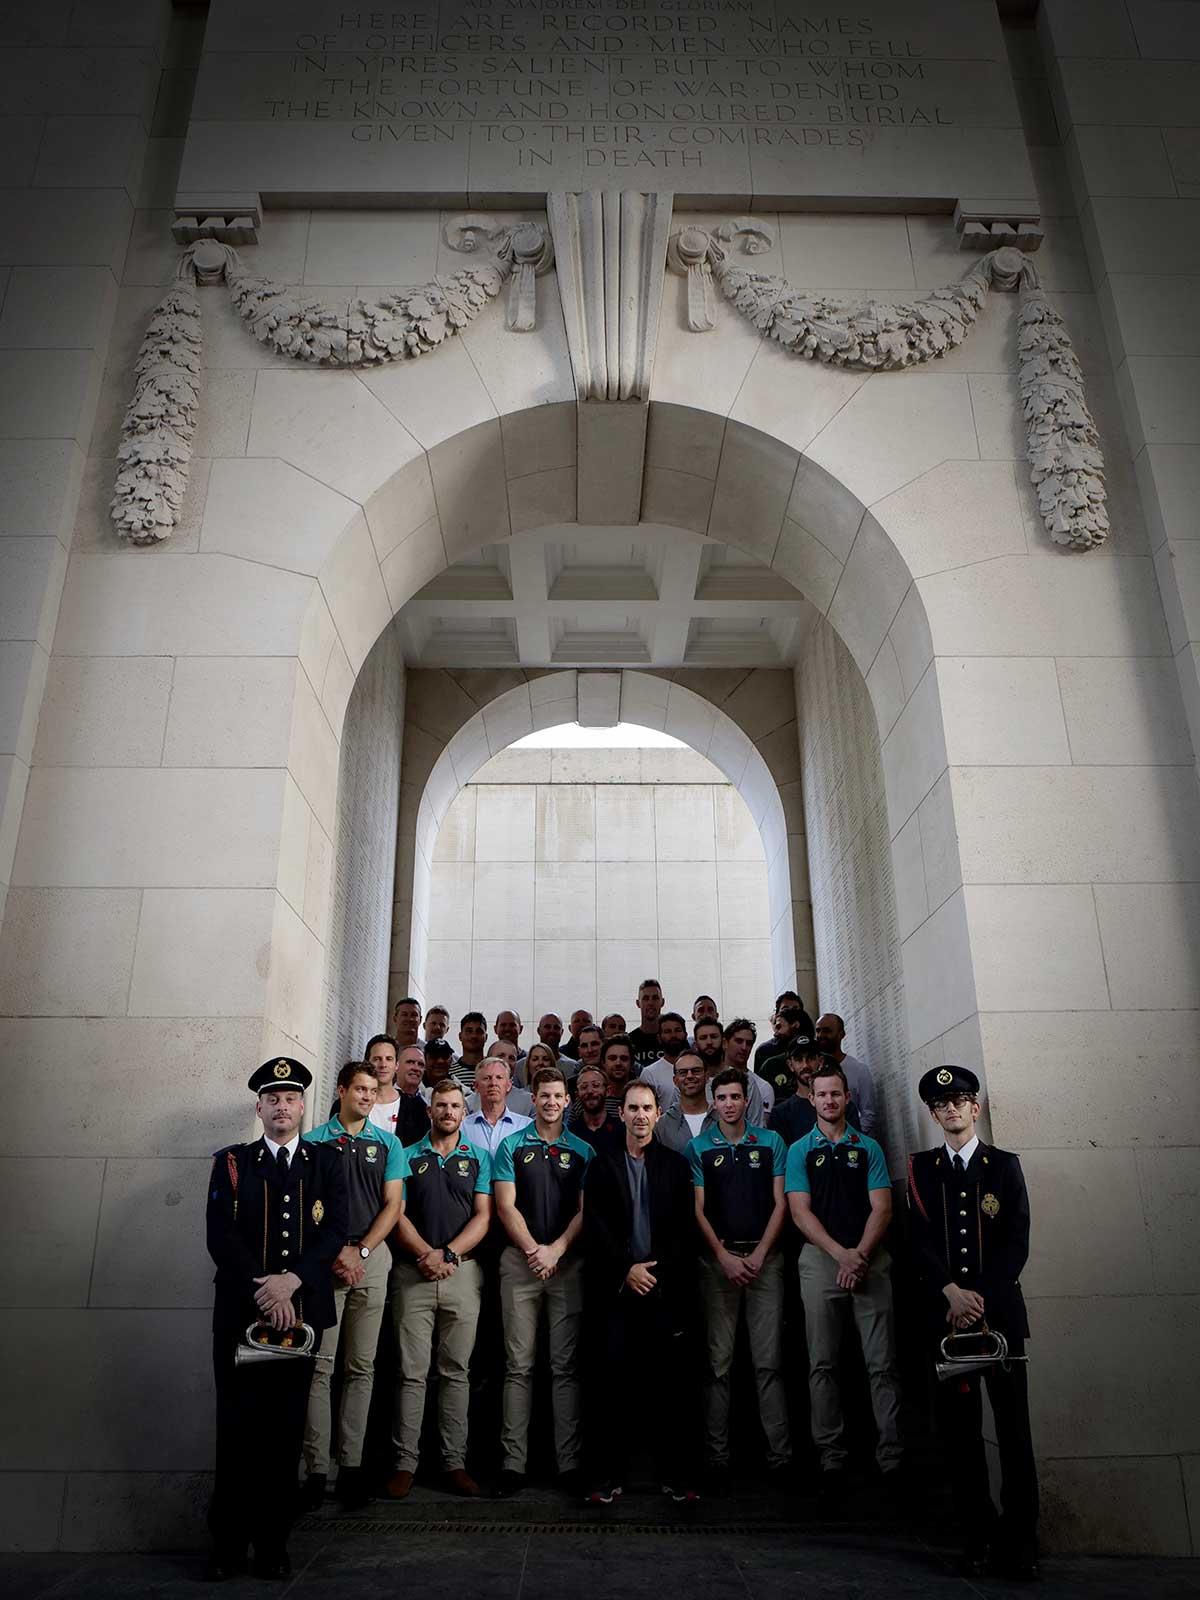 The Australians gathered at Menin Gate // cricket.com.au